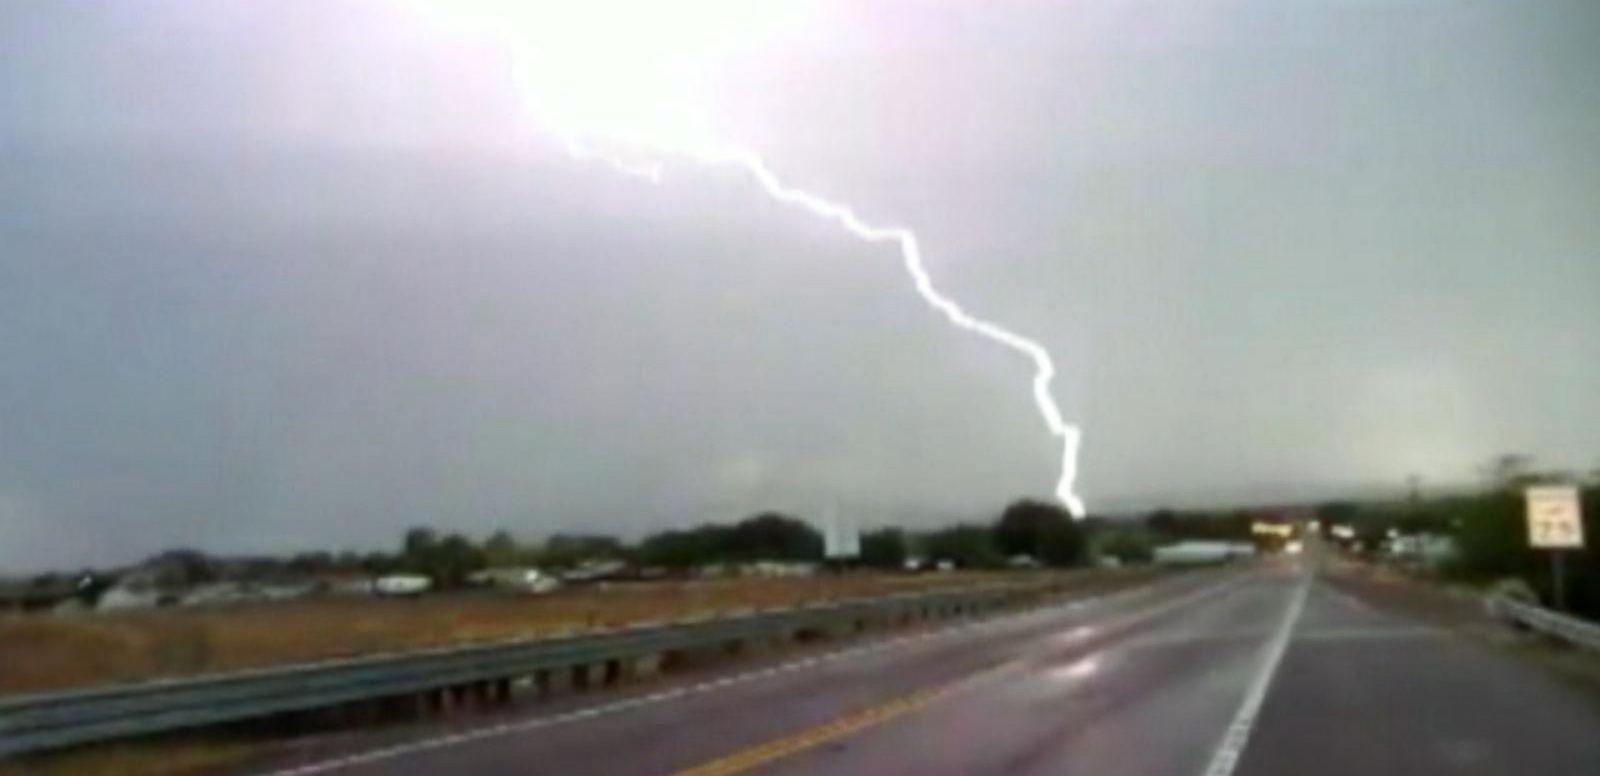 VIDEO: Deadly Lightning Bolt Strikes in Daytona Beach, Florida